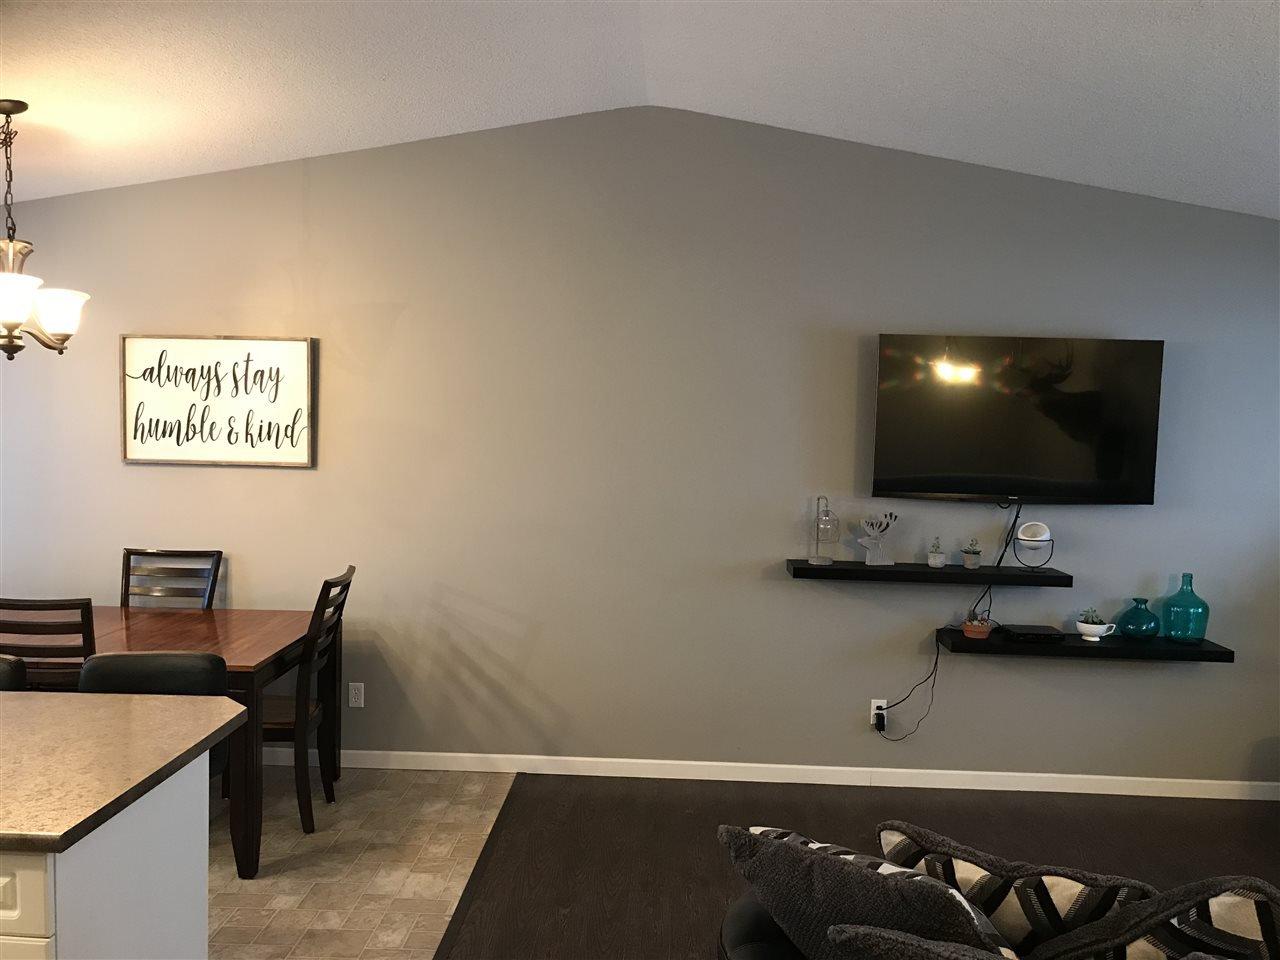 "Photo 5: Photos: 8724 114 Avenue in Fort St. John: Fort St. John - City NE House for sale in ""PANORAMA RIDGE"" (Fort St. John (Zone 60))  : MLS®# R2428633"